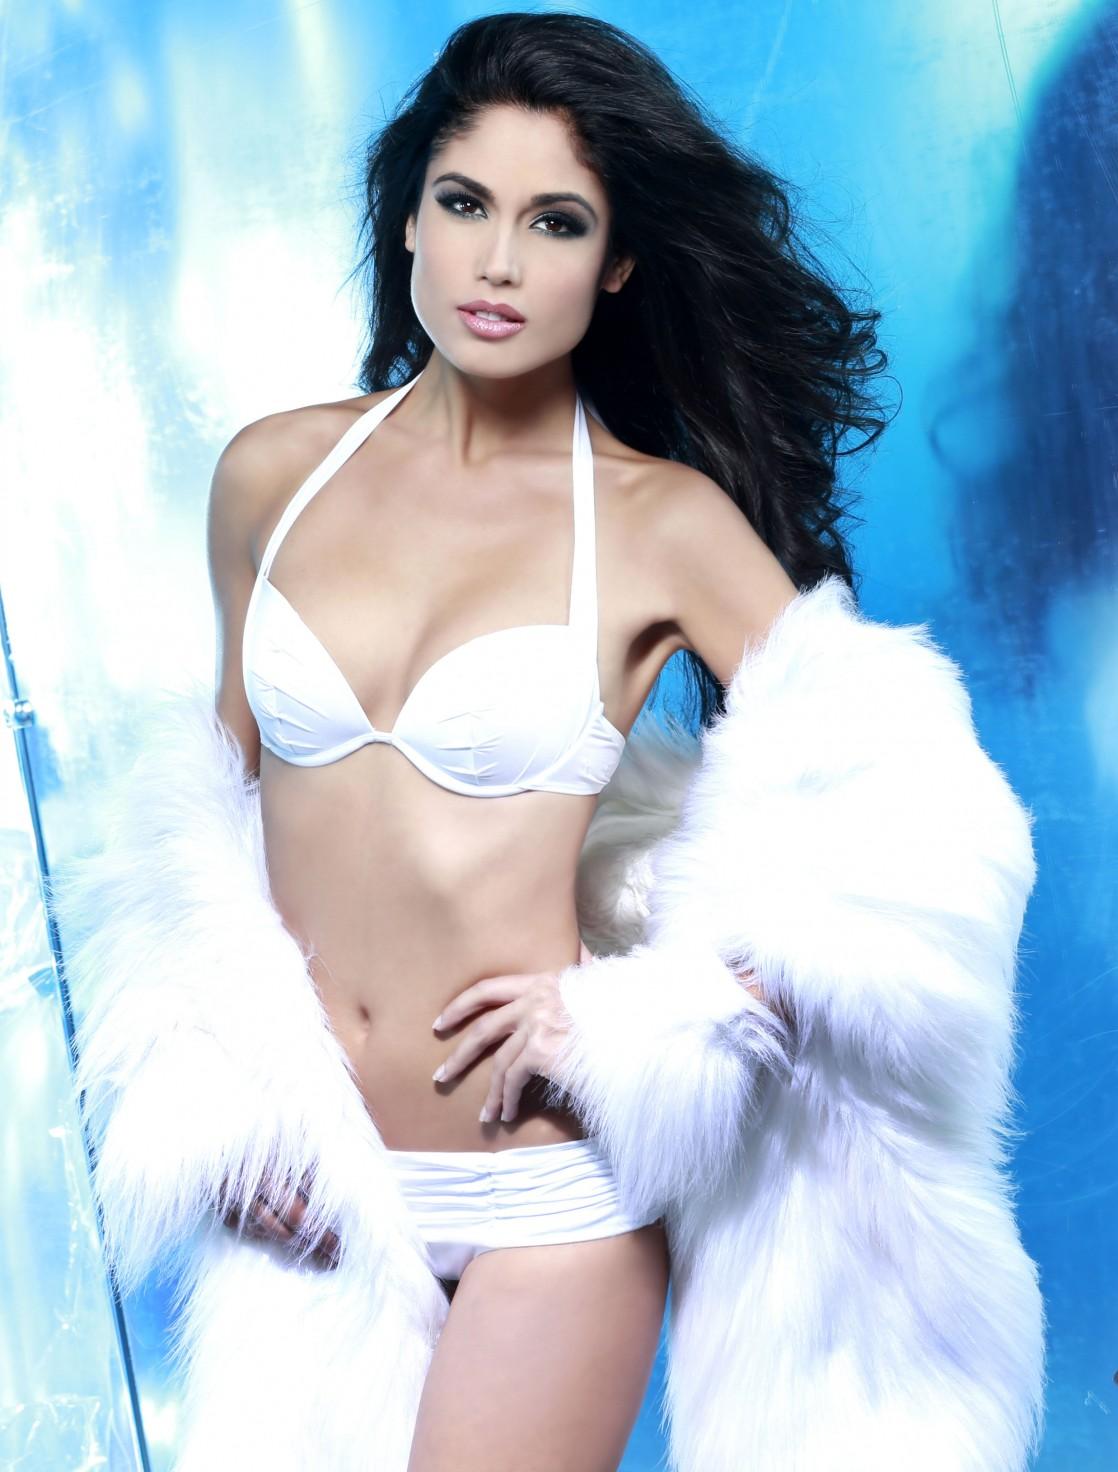 patricia yurena rodriguez, miss espana 2008/2013, 1st runner-up de miss universe 2013. 1118fu13